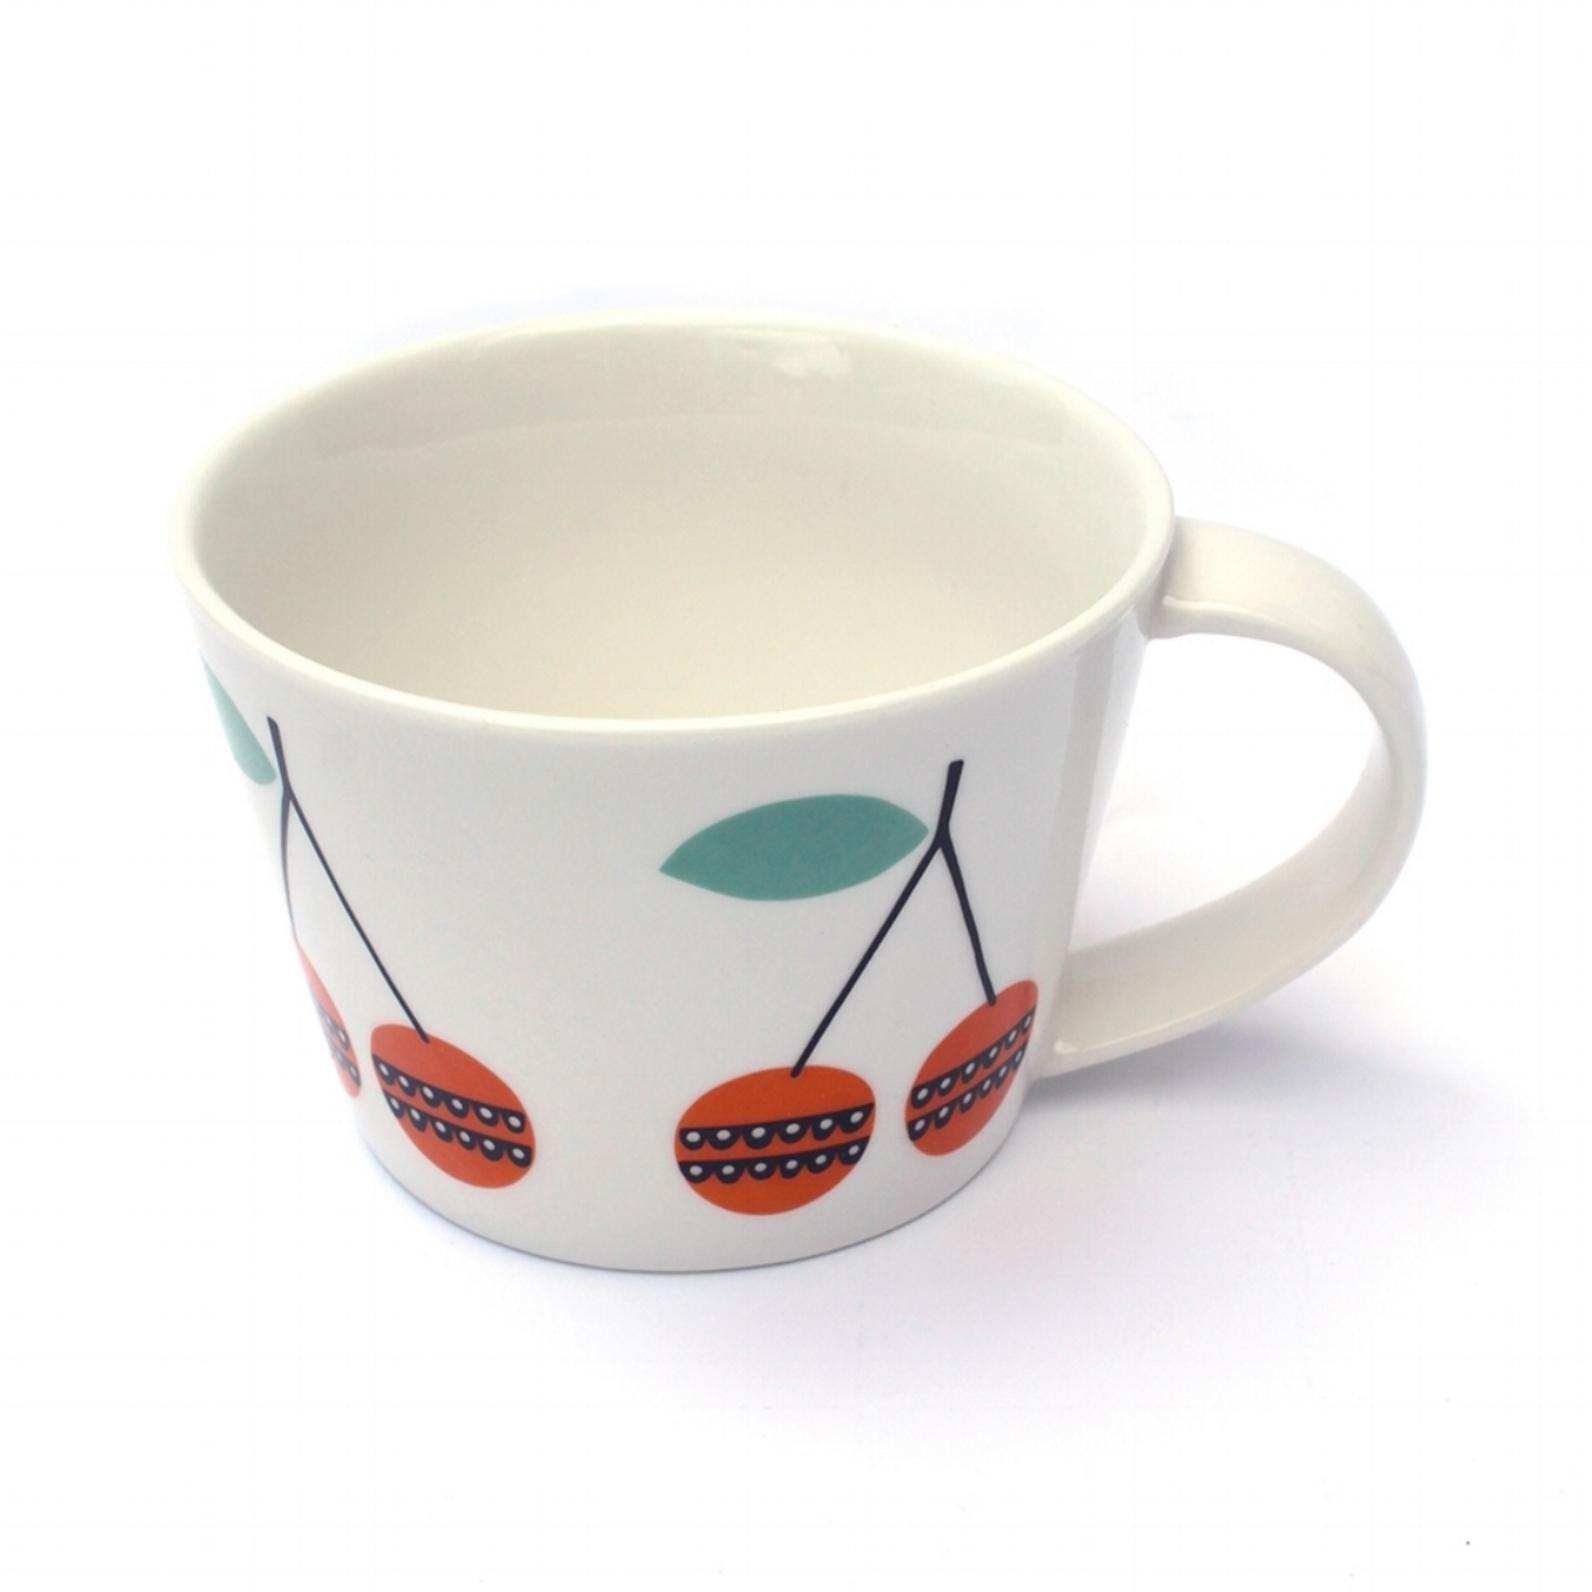 Cherry Mug with Make International